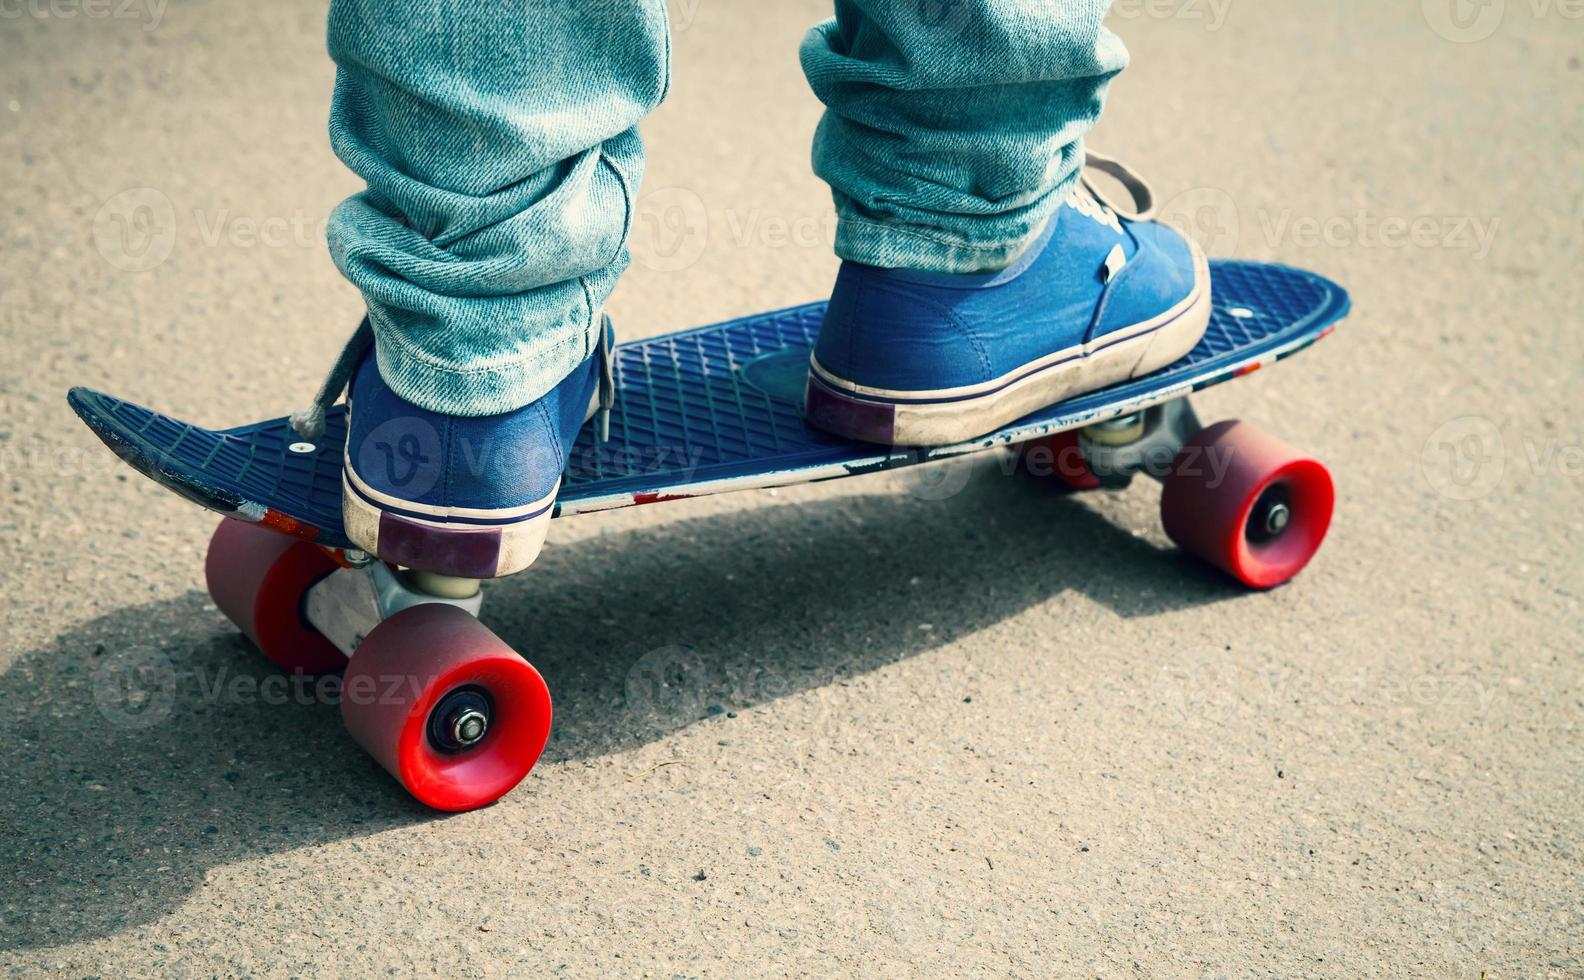 Skater en gumshoes de pie sobre su patín foto